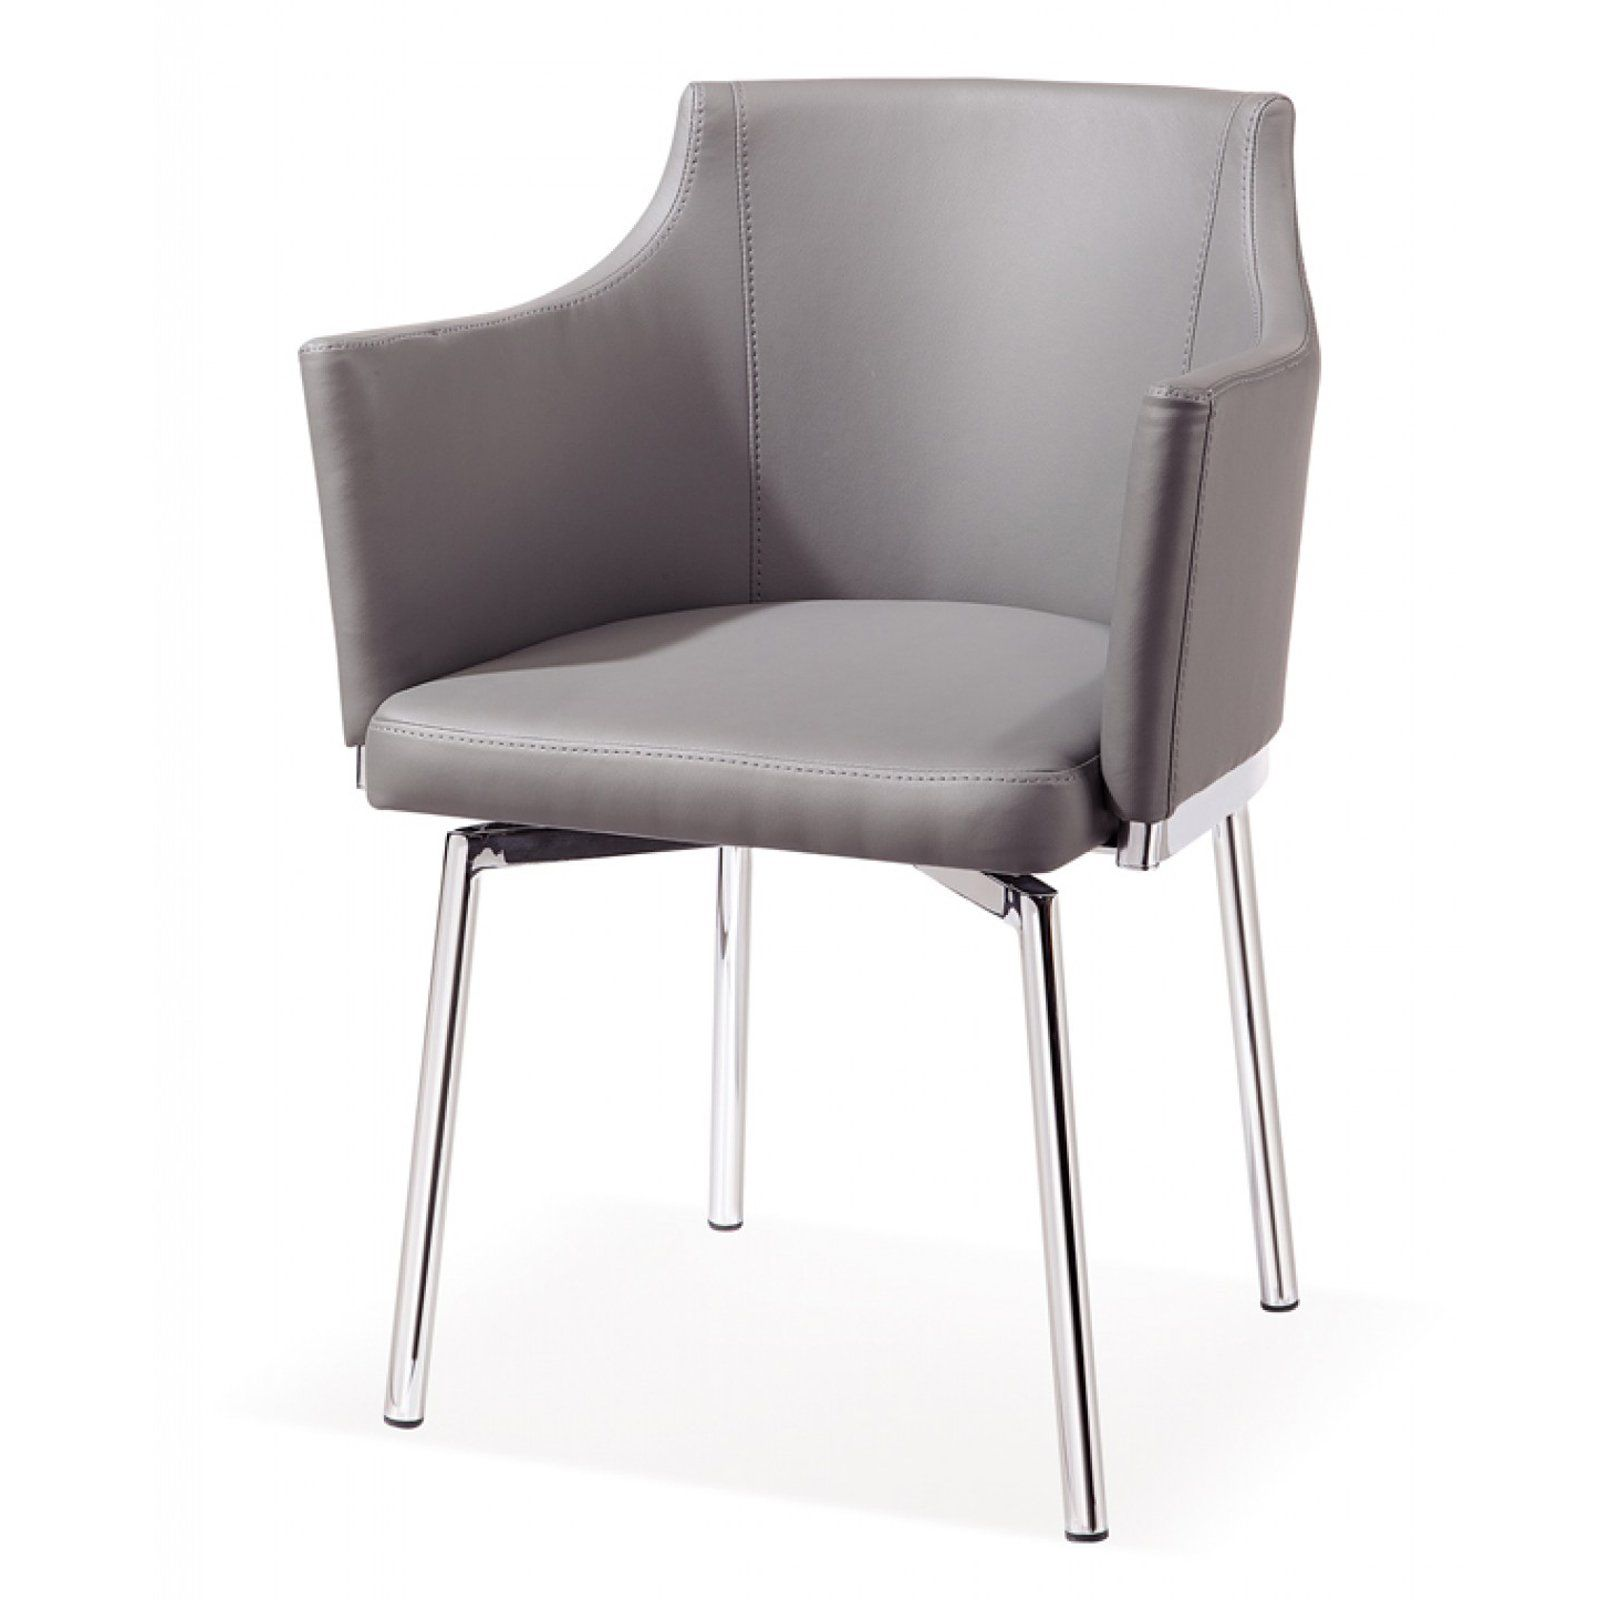 Modrest Kaweah Dining Arm Chair - 71592